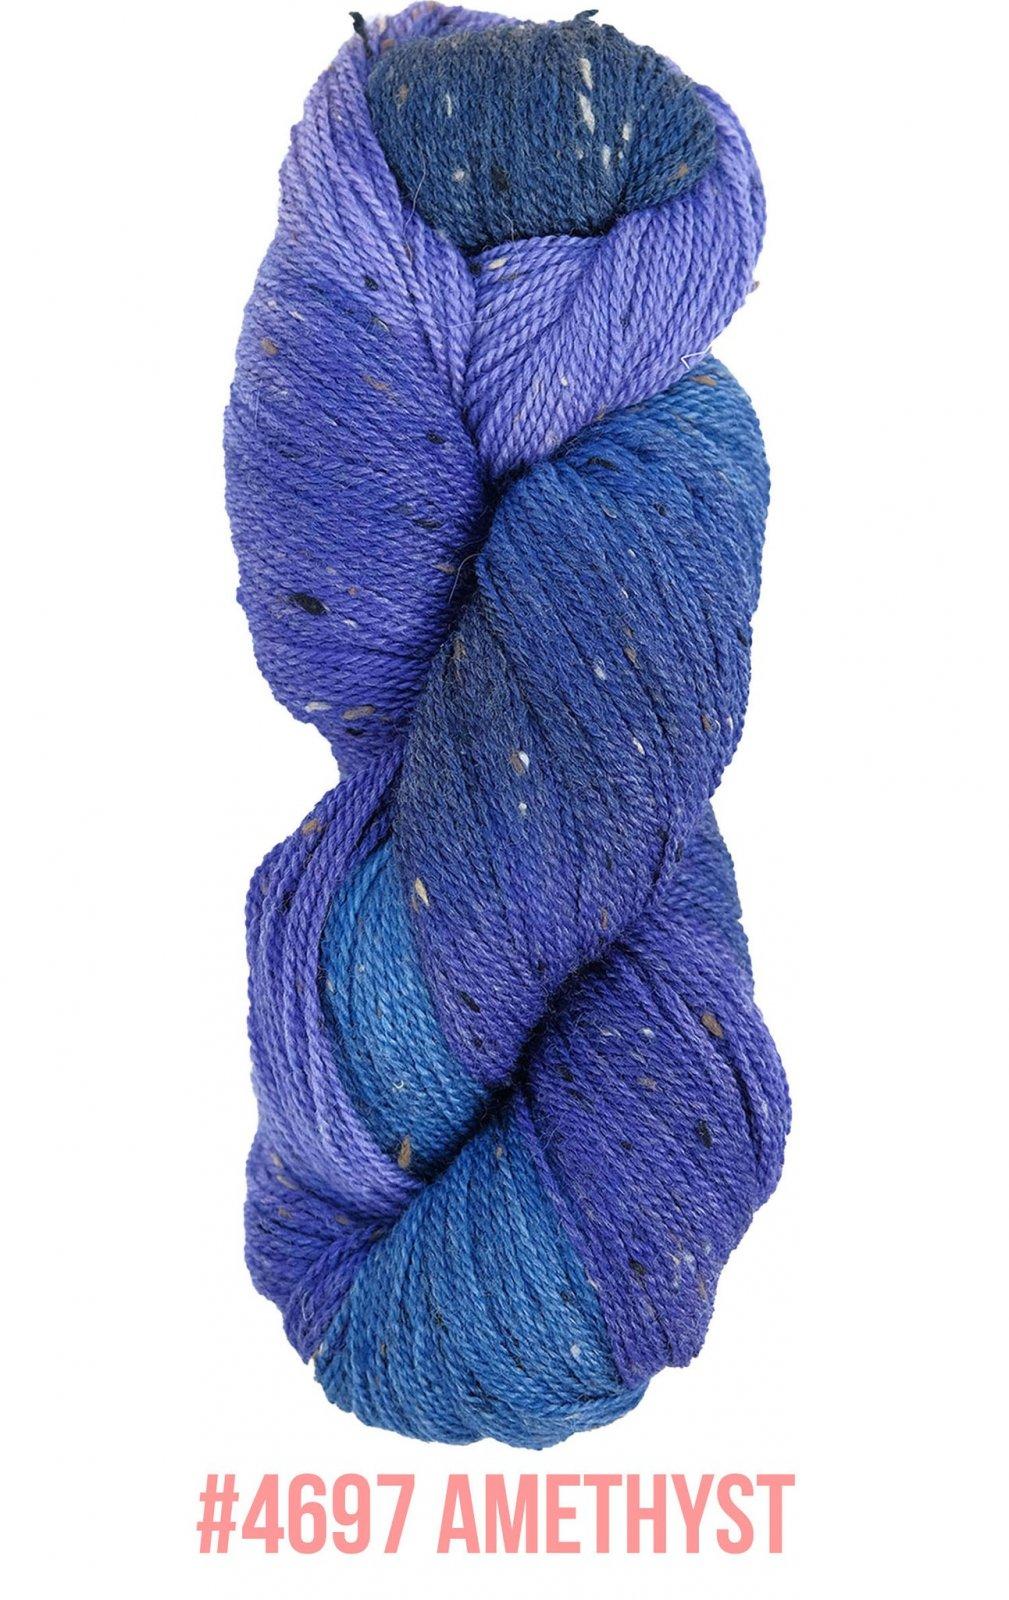 Knit One Kettle Tweed Amethyst #4697